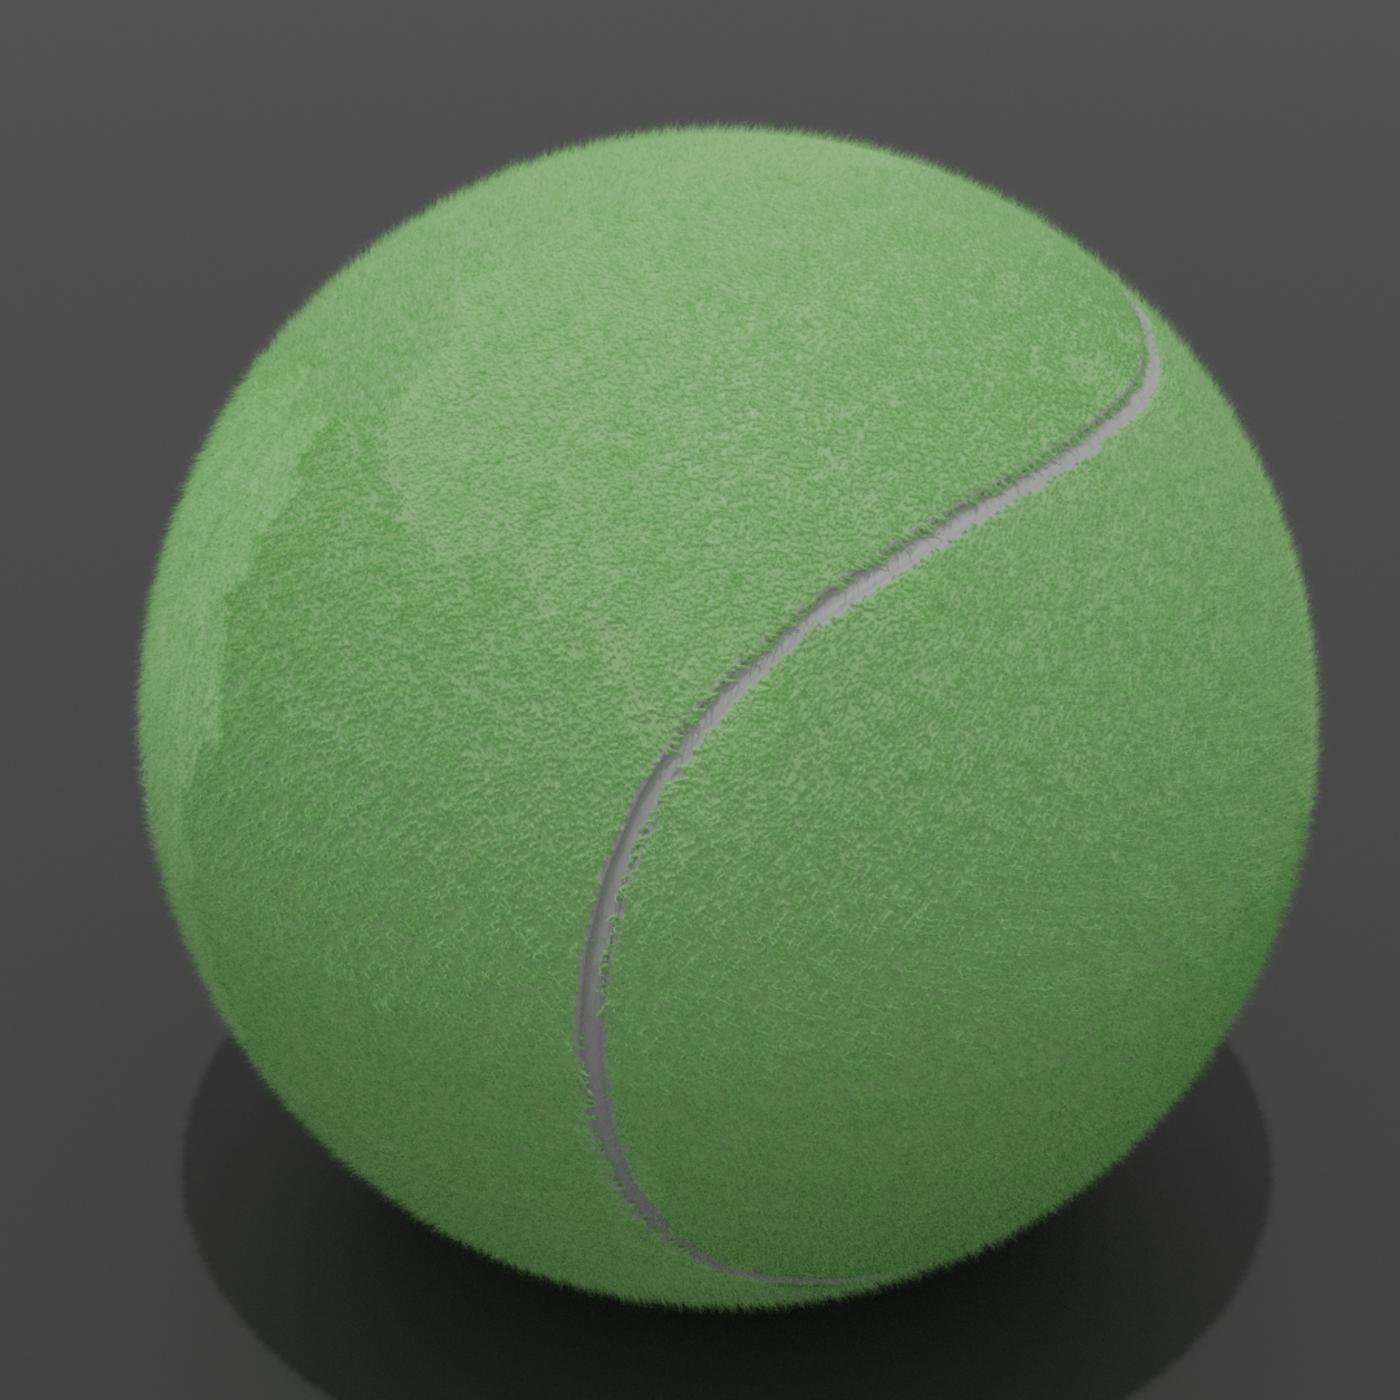 Sportballs